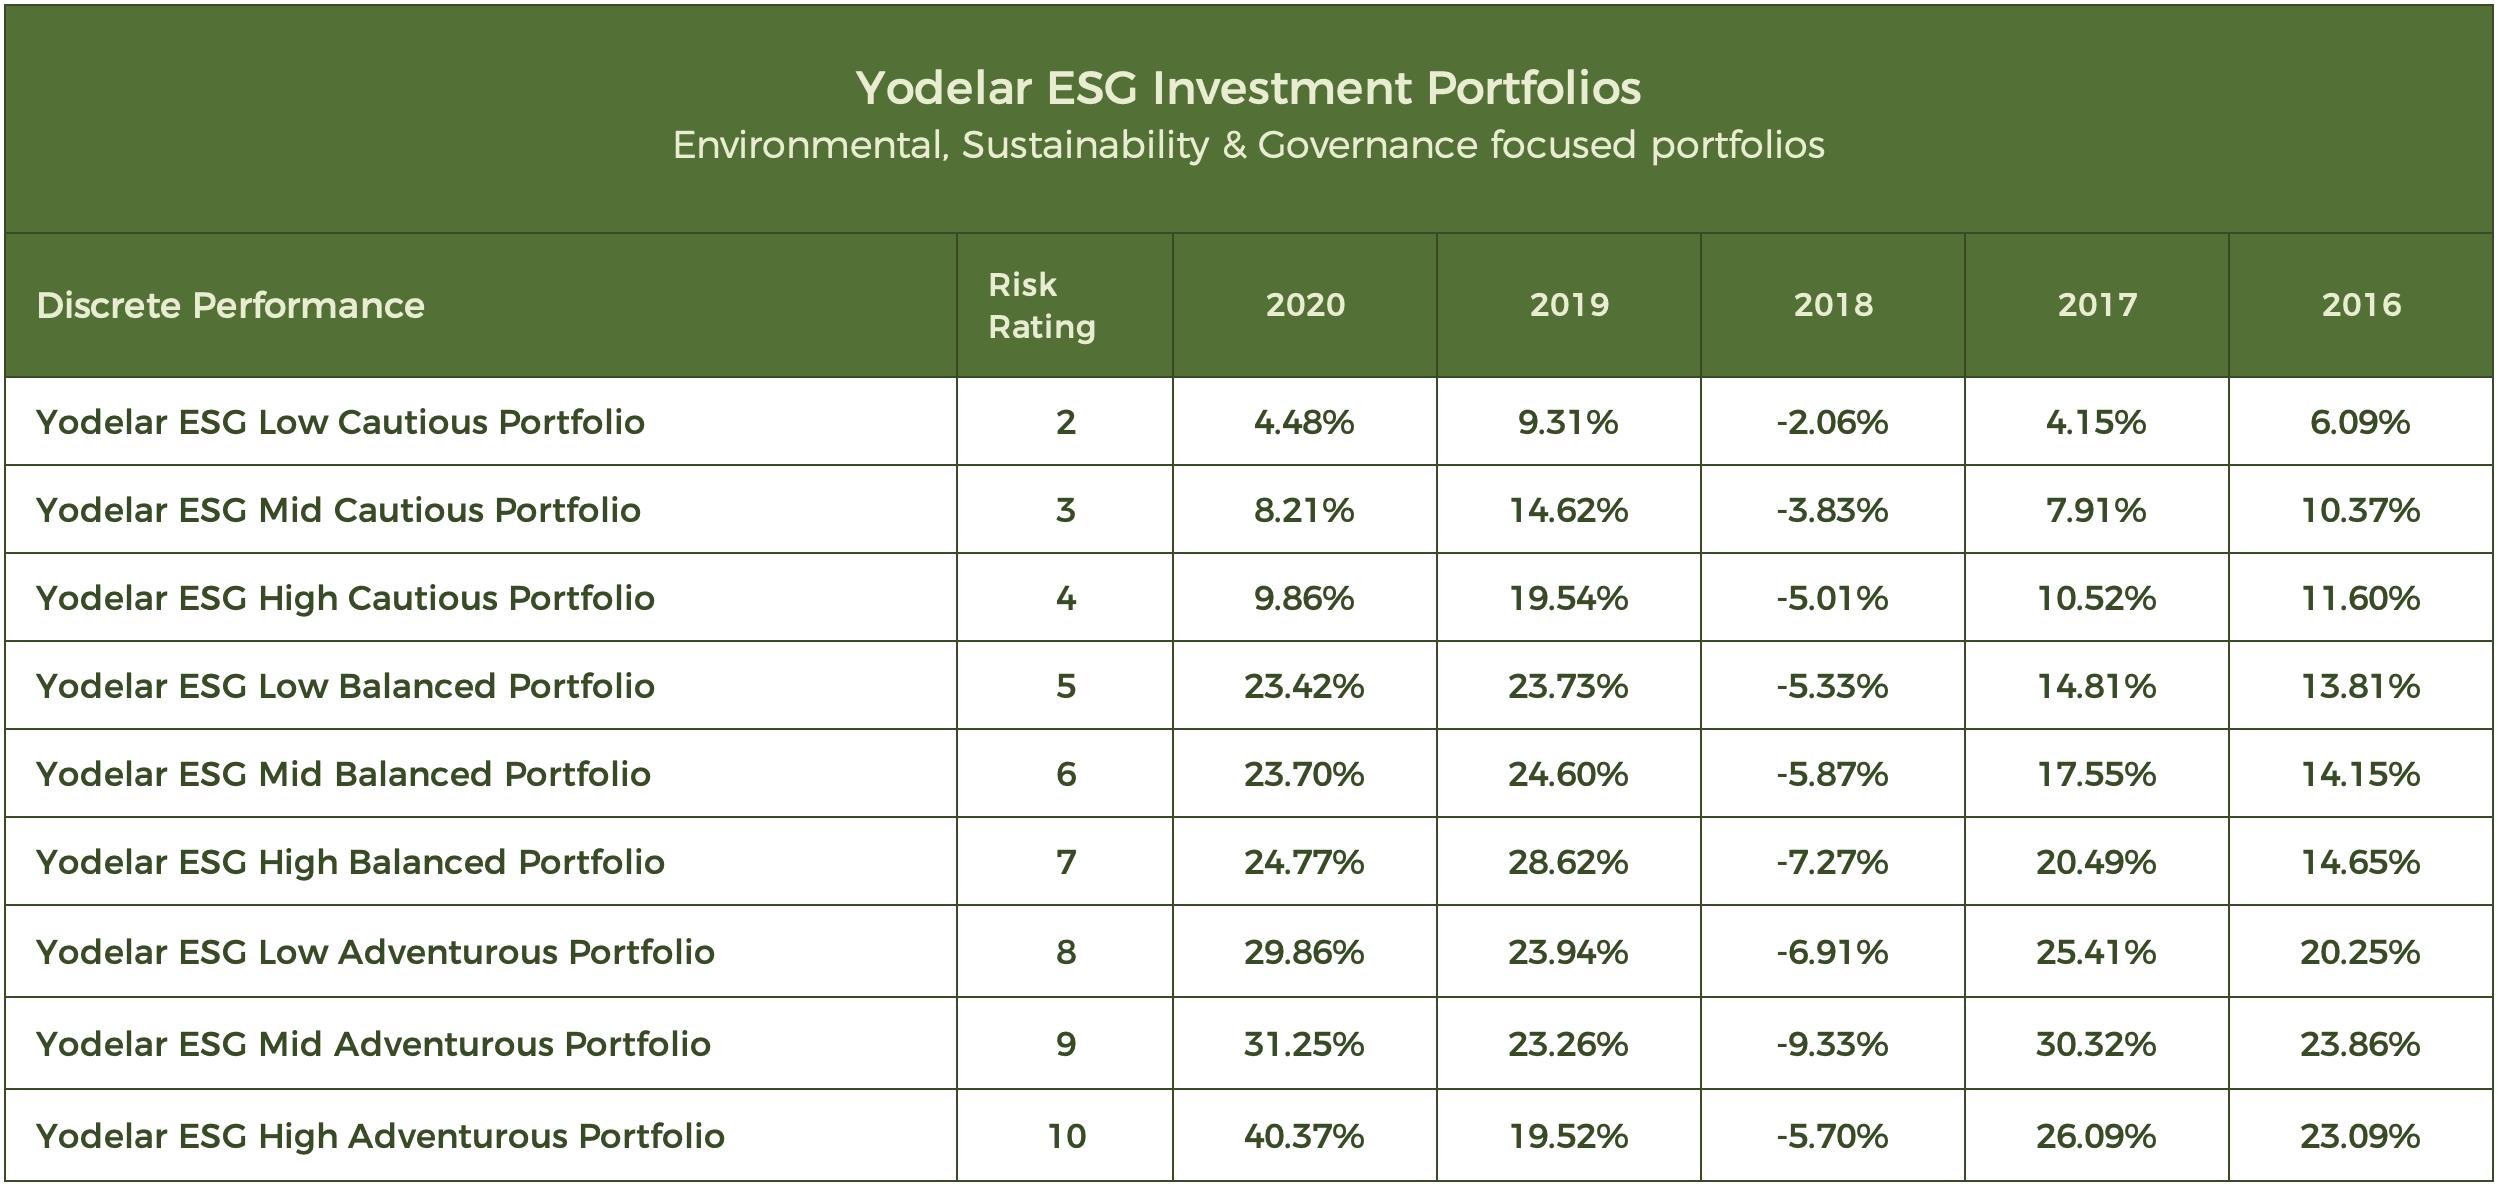 Screenshot Yodelar Investments ESG Discrete Performance-09-02 at 09.03.29